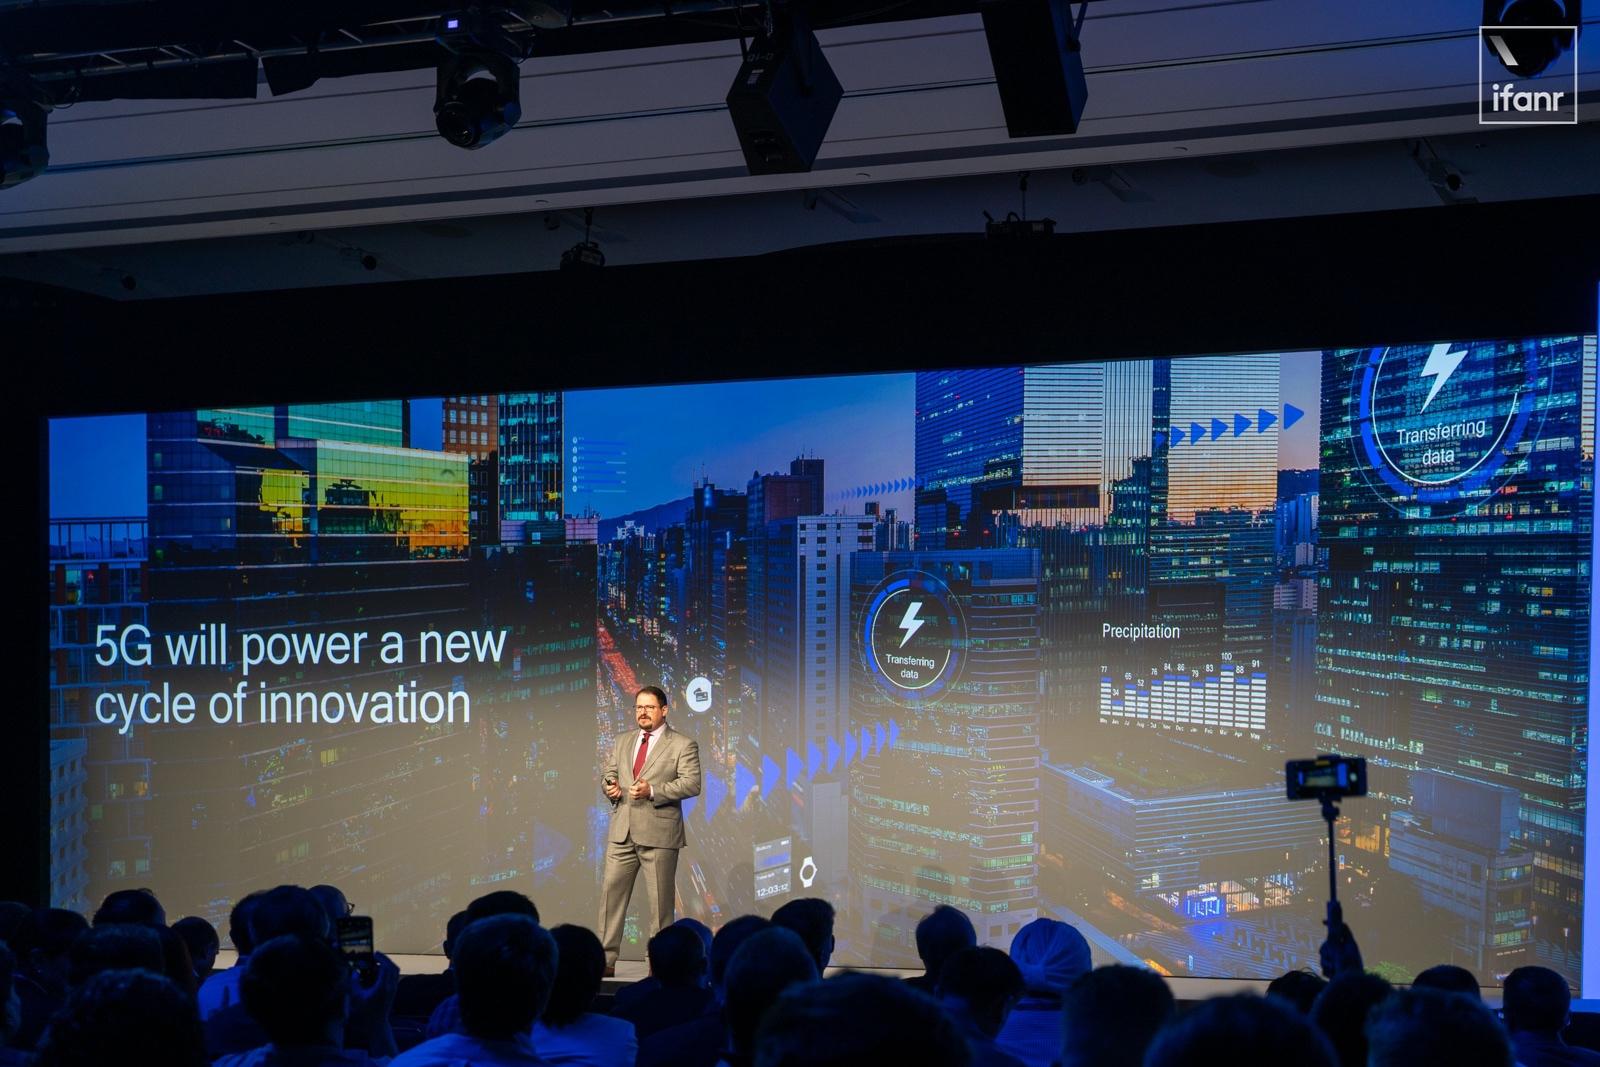 5G 时代的高通,想要覆盖 1000 亿美元的广阔市场  移动互联  第2张